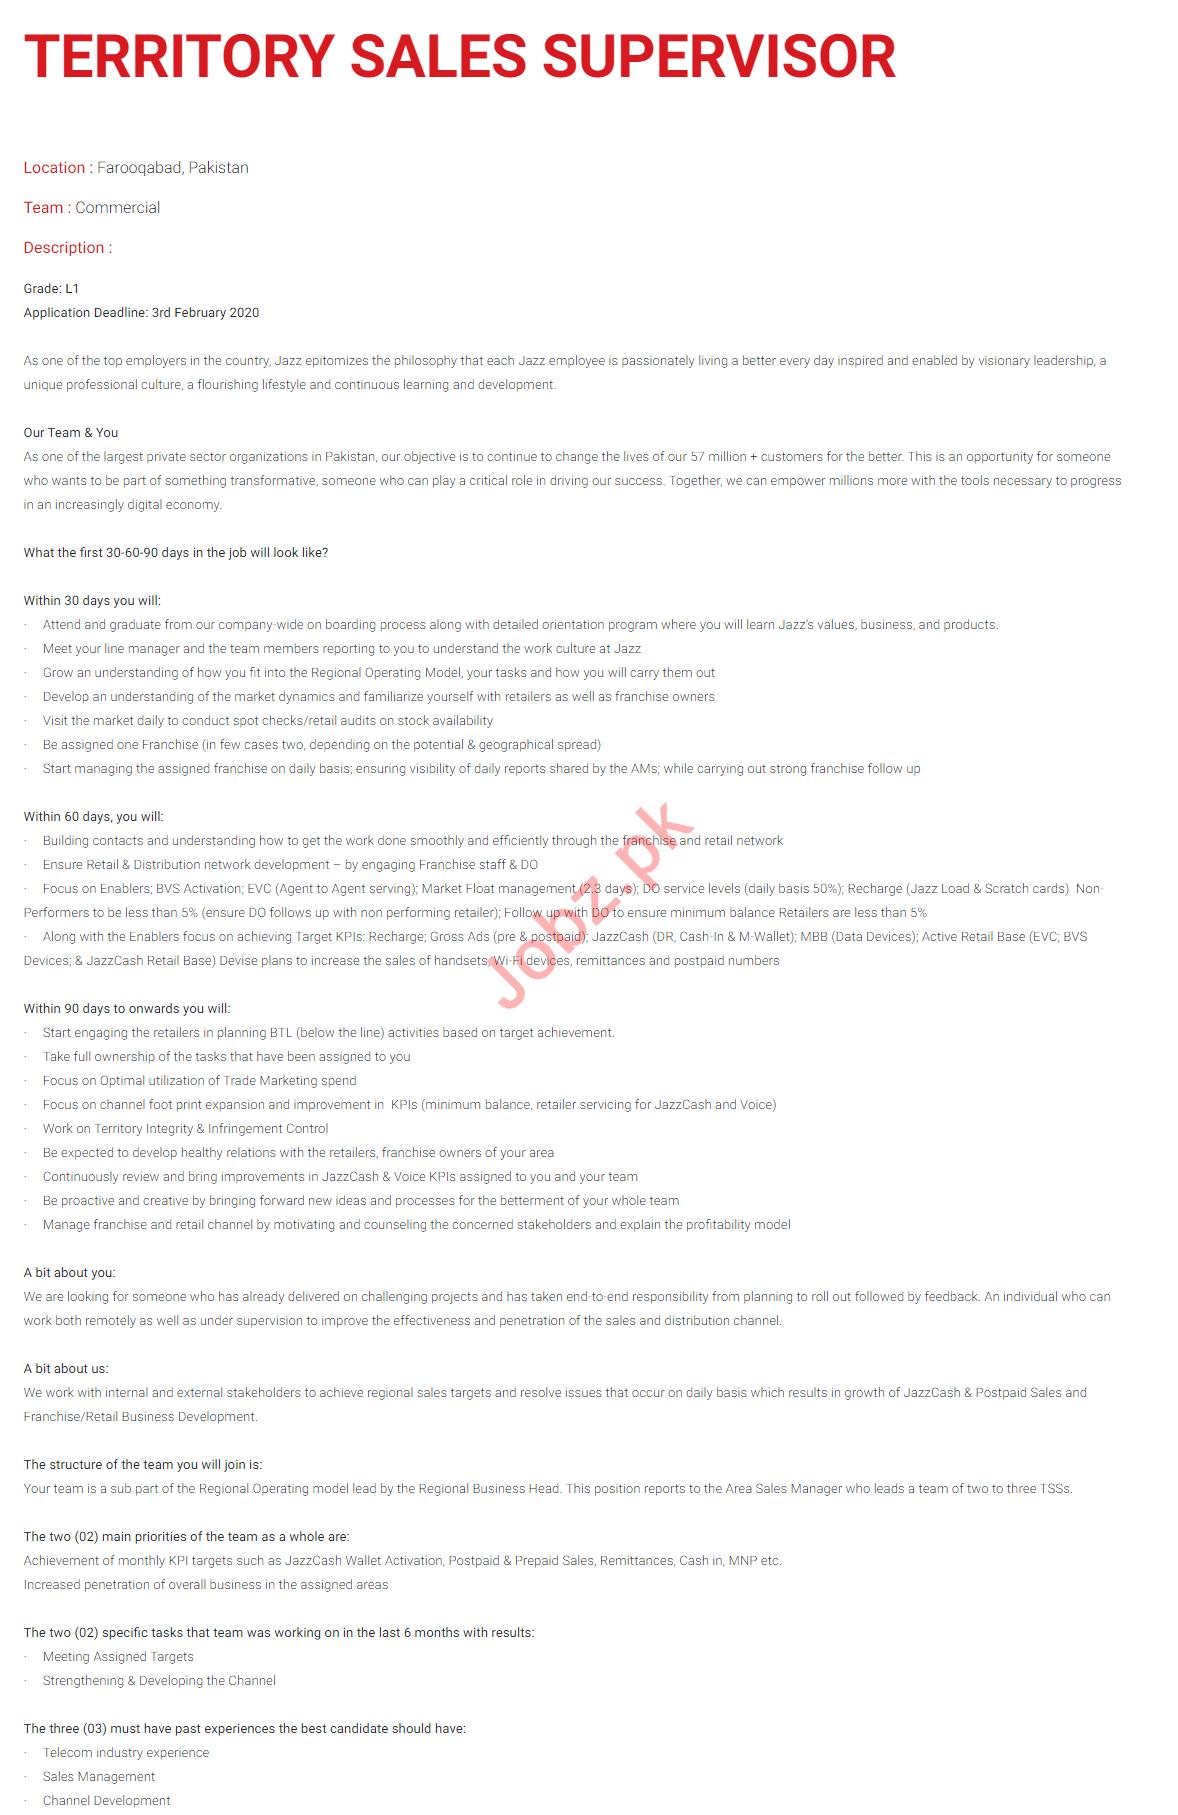 Territory Sales Supervisor Jobs 2020 in Farooqabad